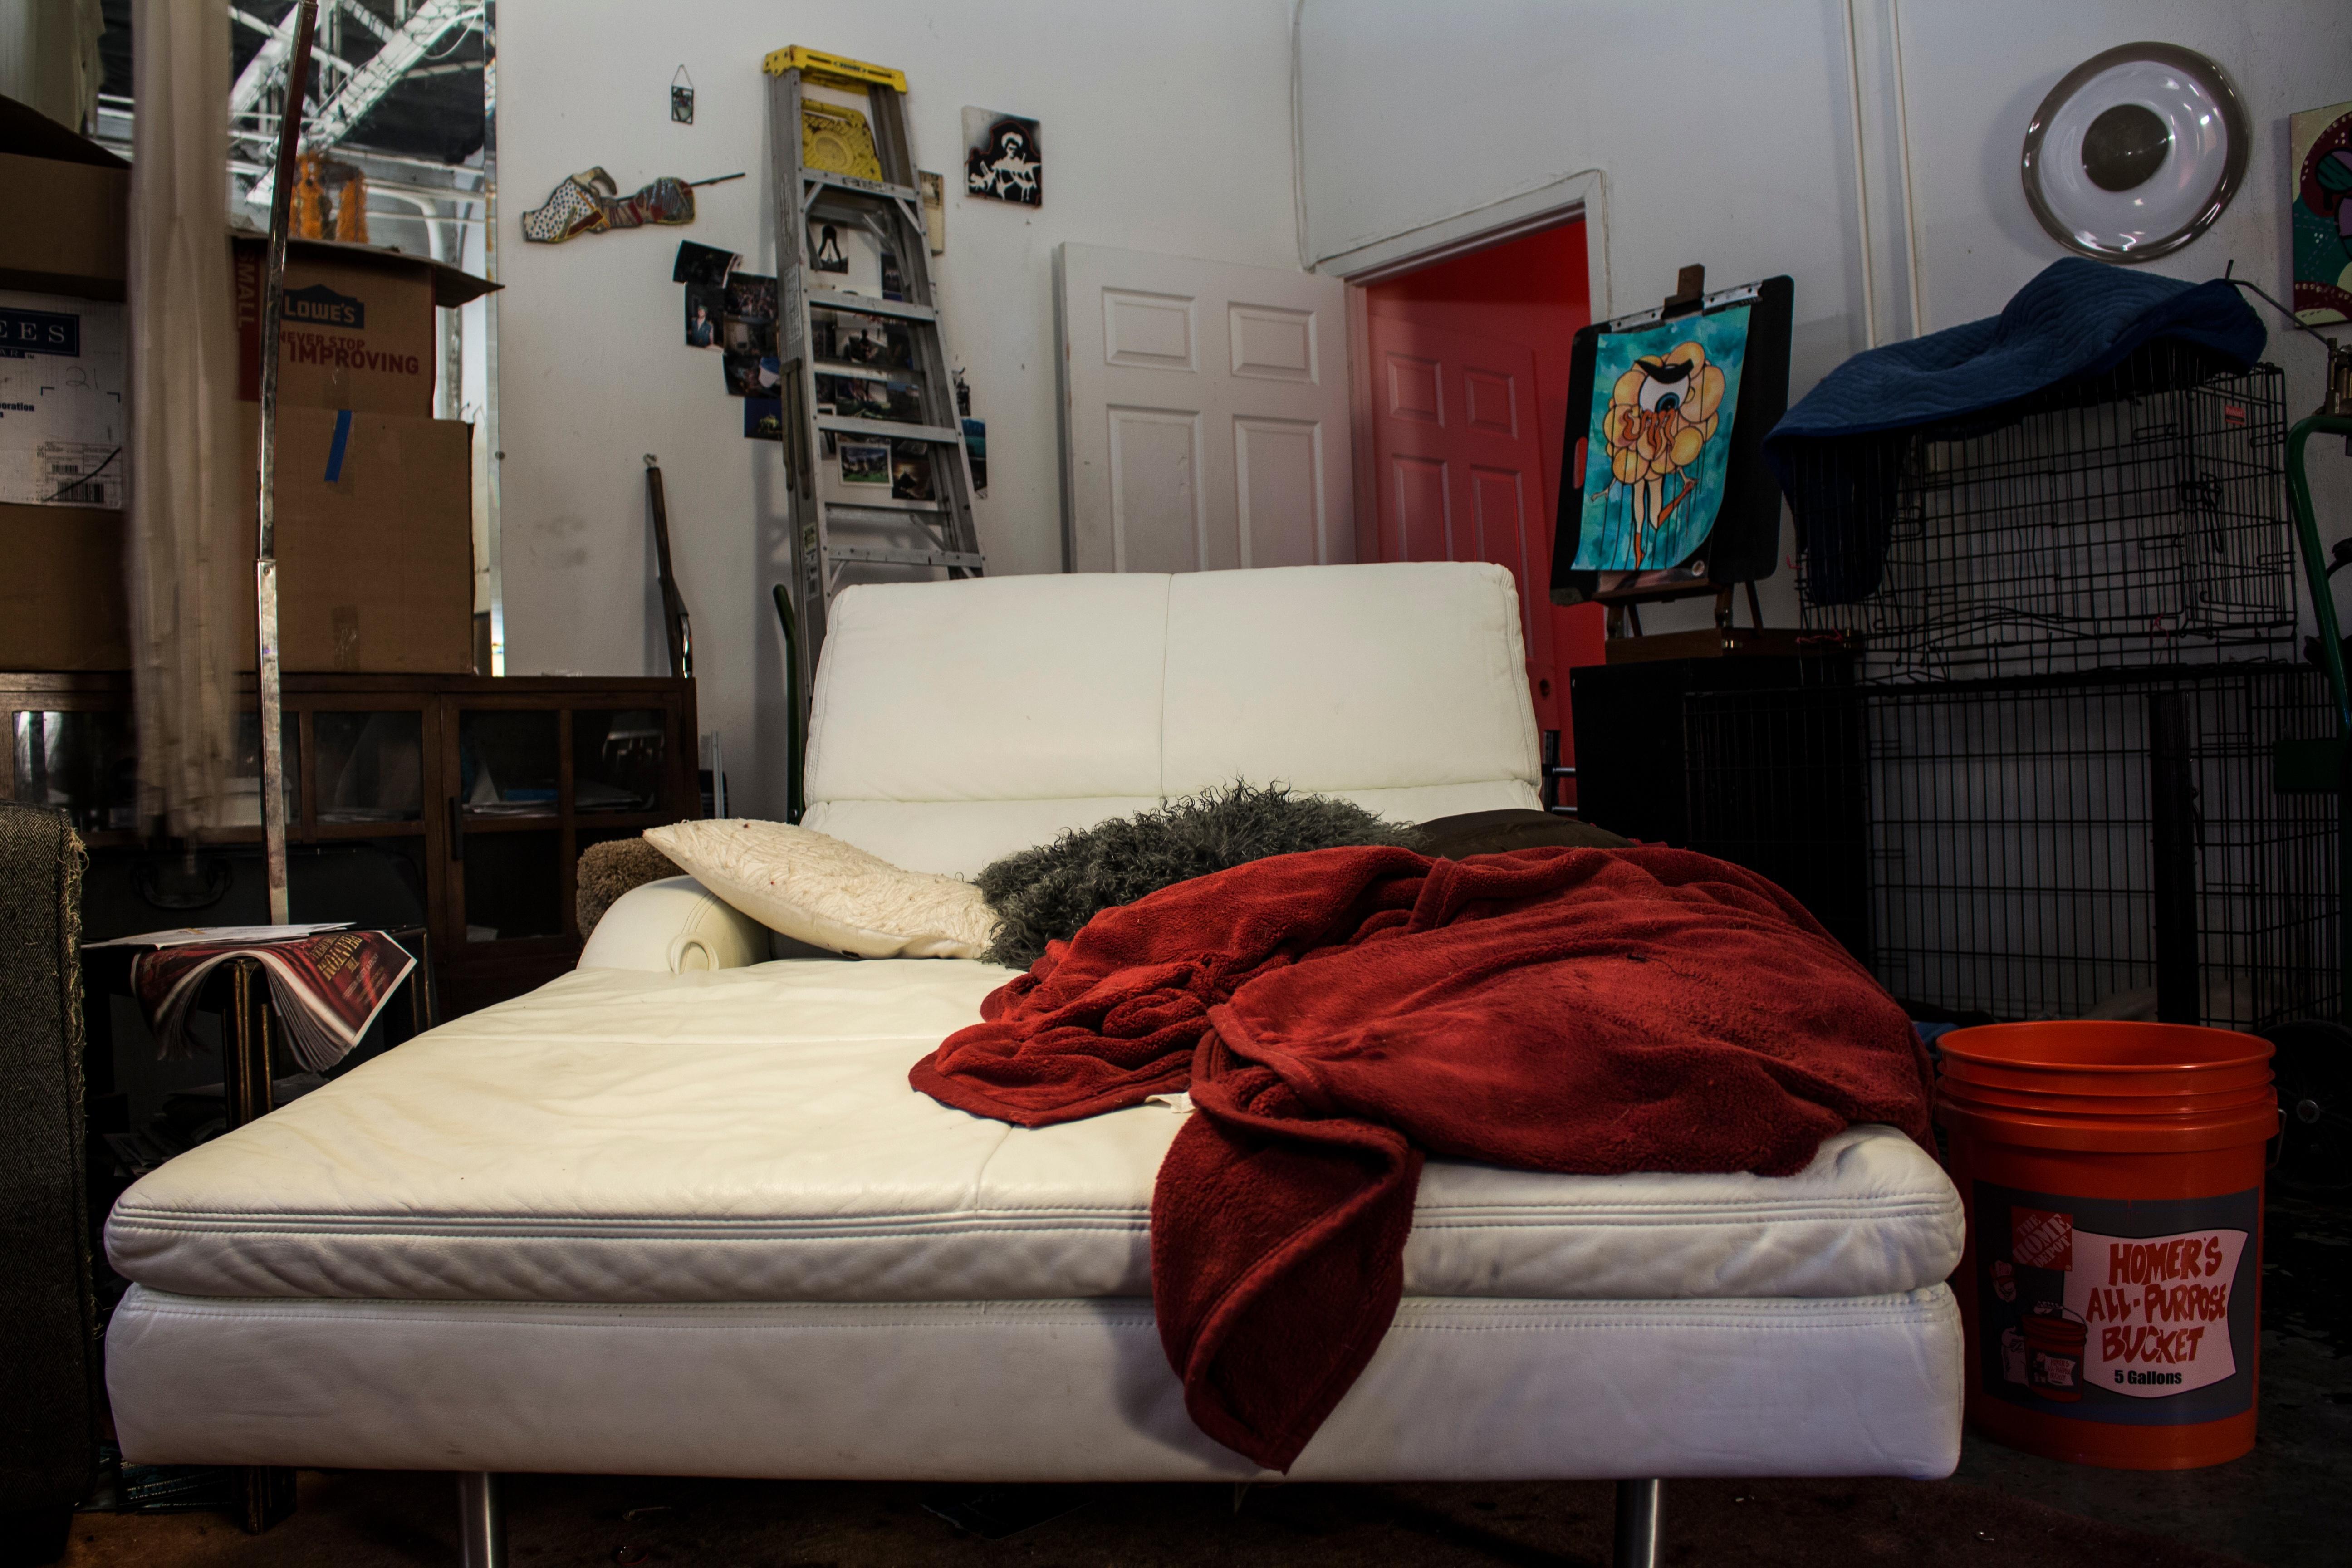 Bed In Woonkamer : Gratis afbeeldingen huis woonkamer meubilair kamer